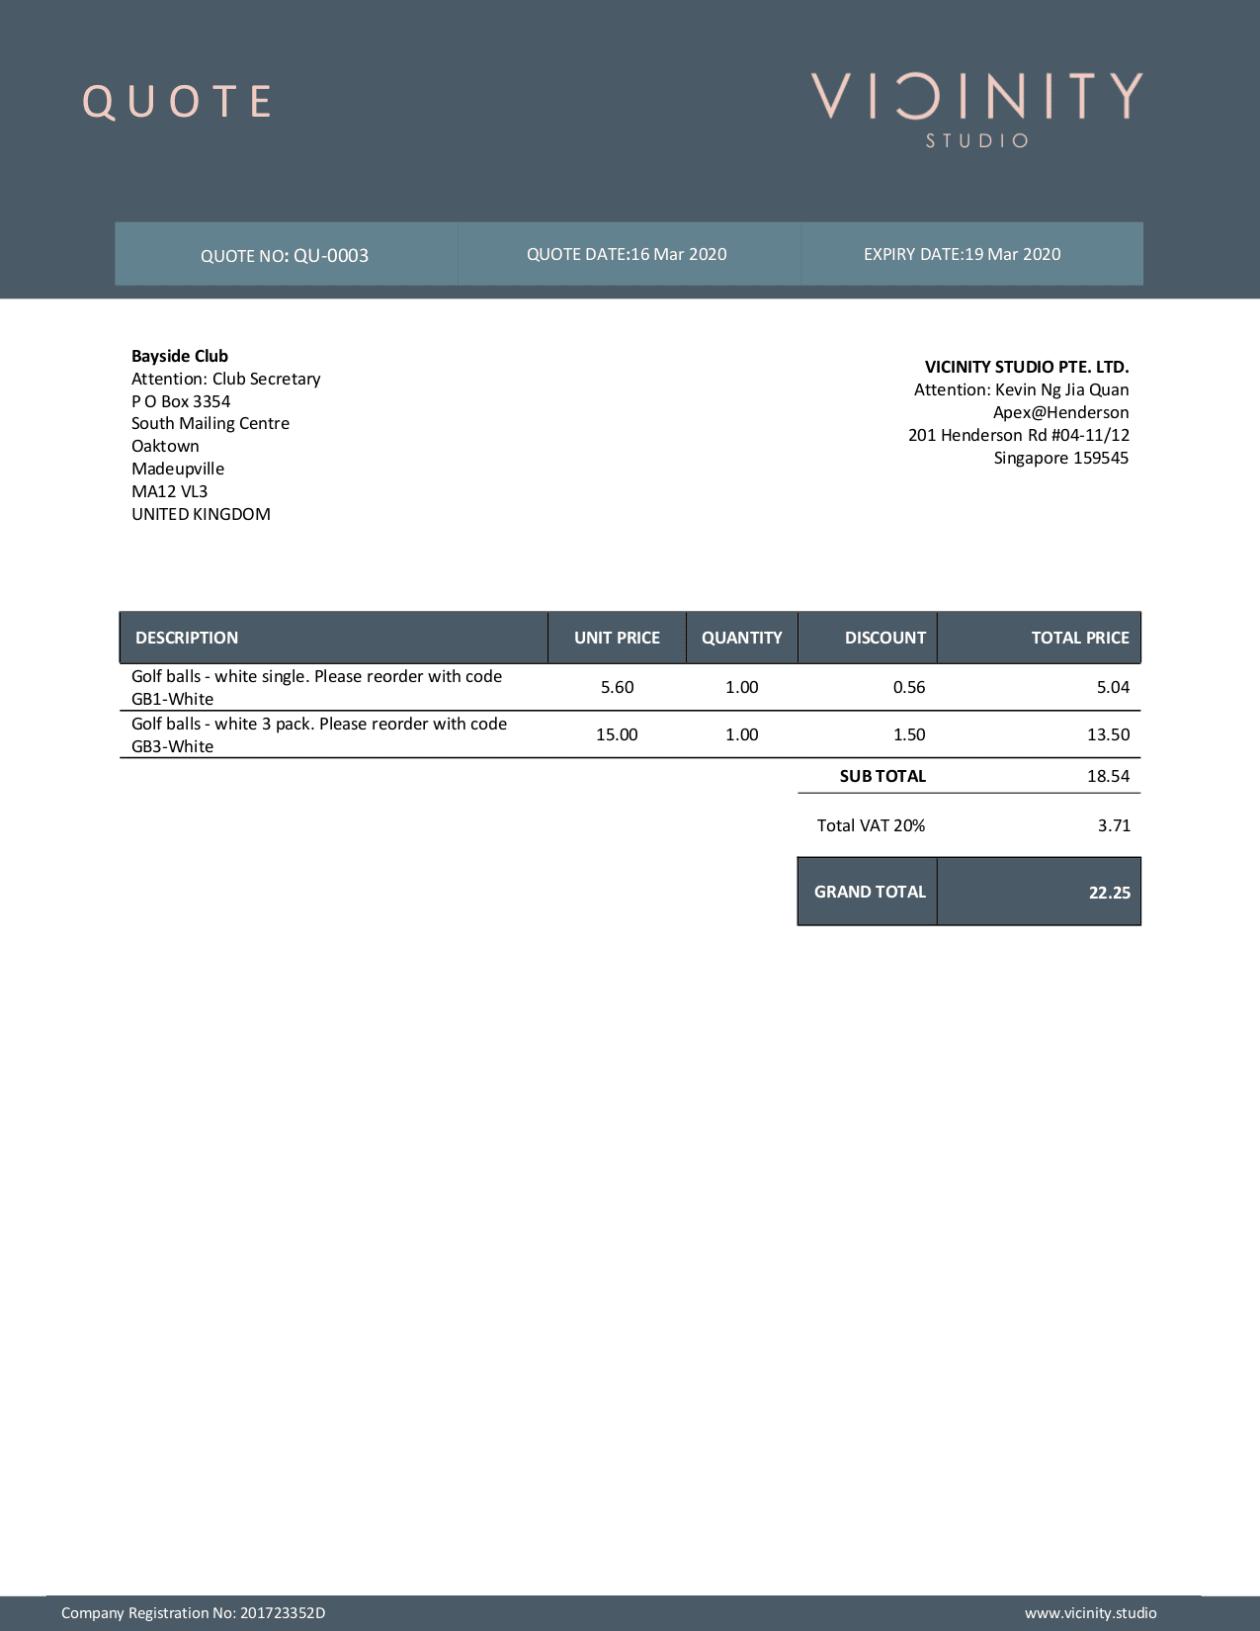 Amolesh I Will Design Xero Custom Invoice Template Branding Theme For 20 On Fiverr Com Invoice Template Customs Invoice Design